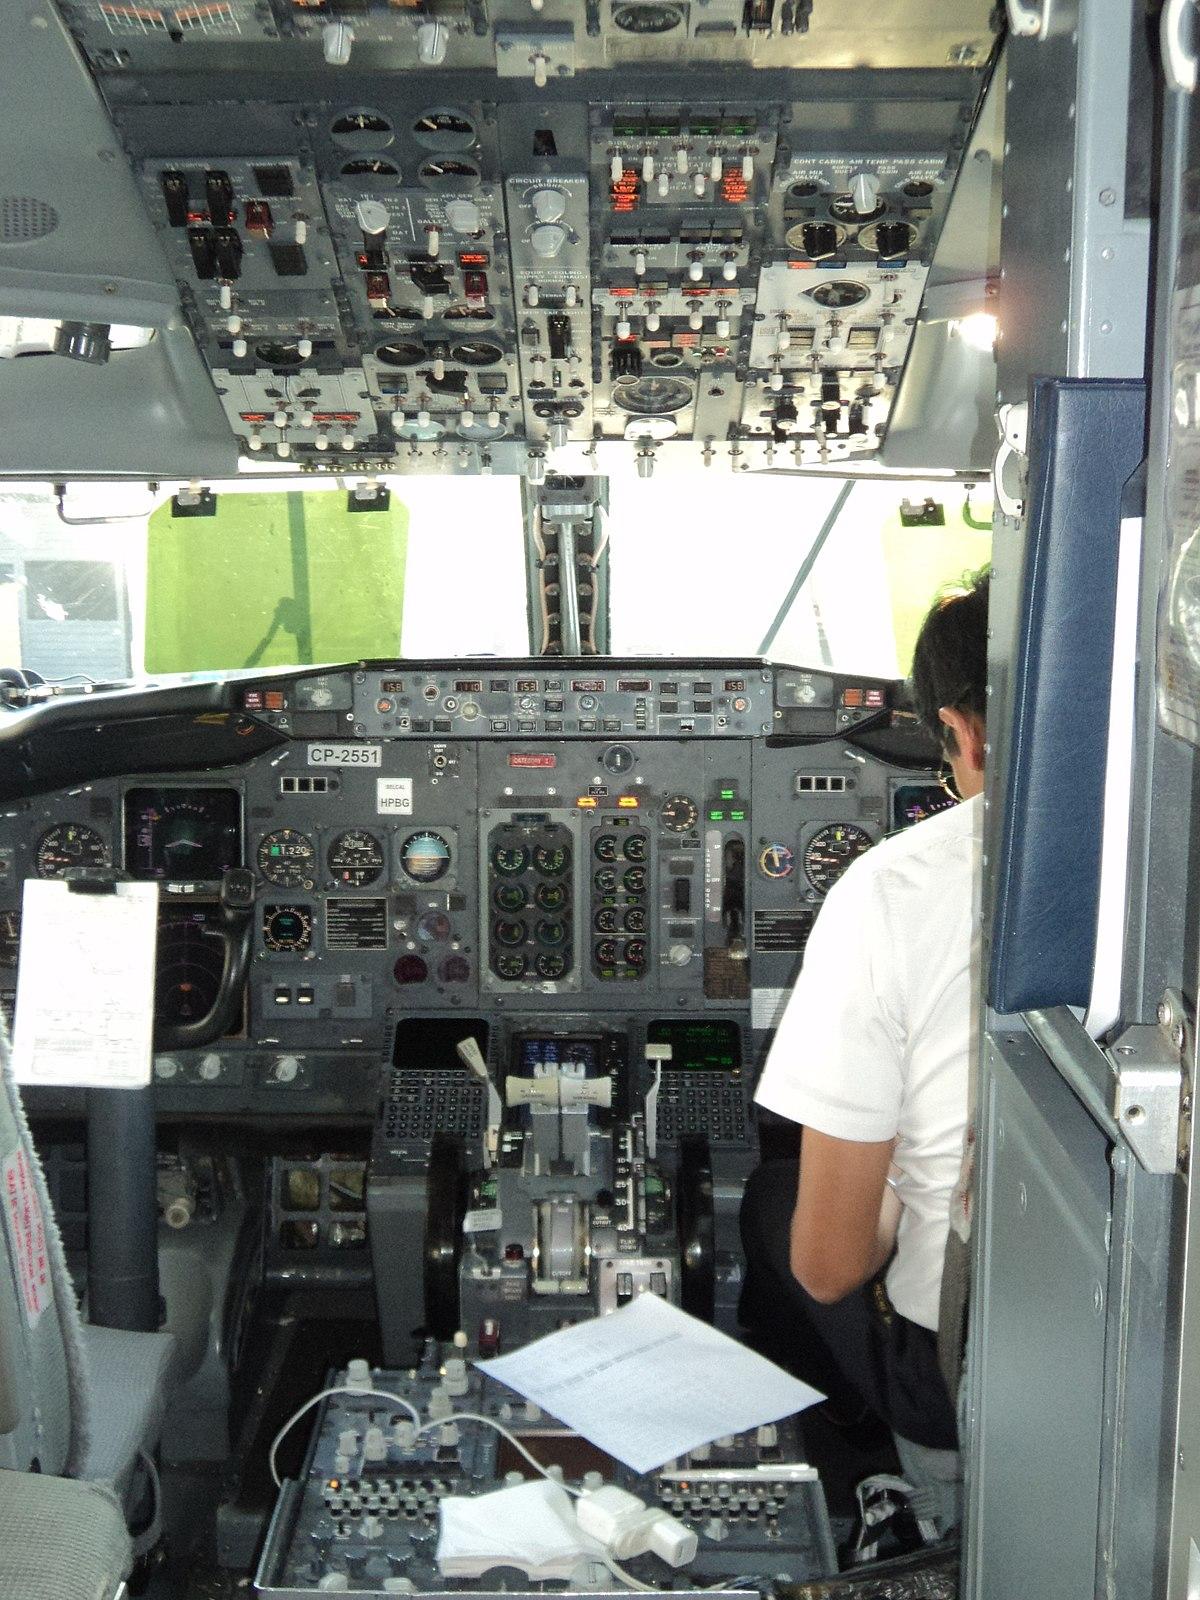 File Cabina De Un Boeing 737-300 Jpg